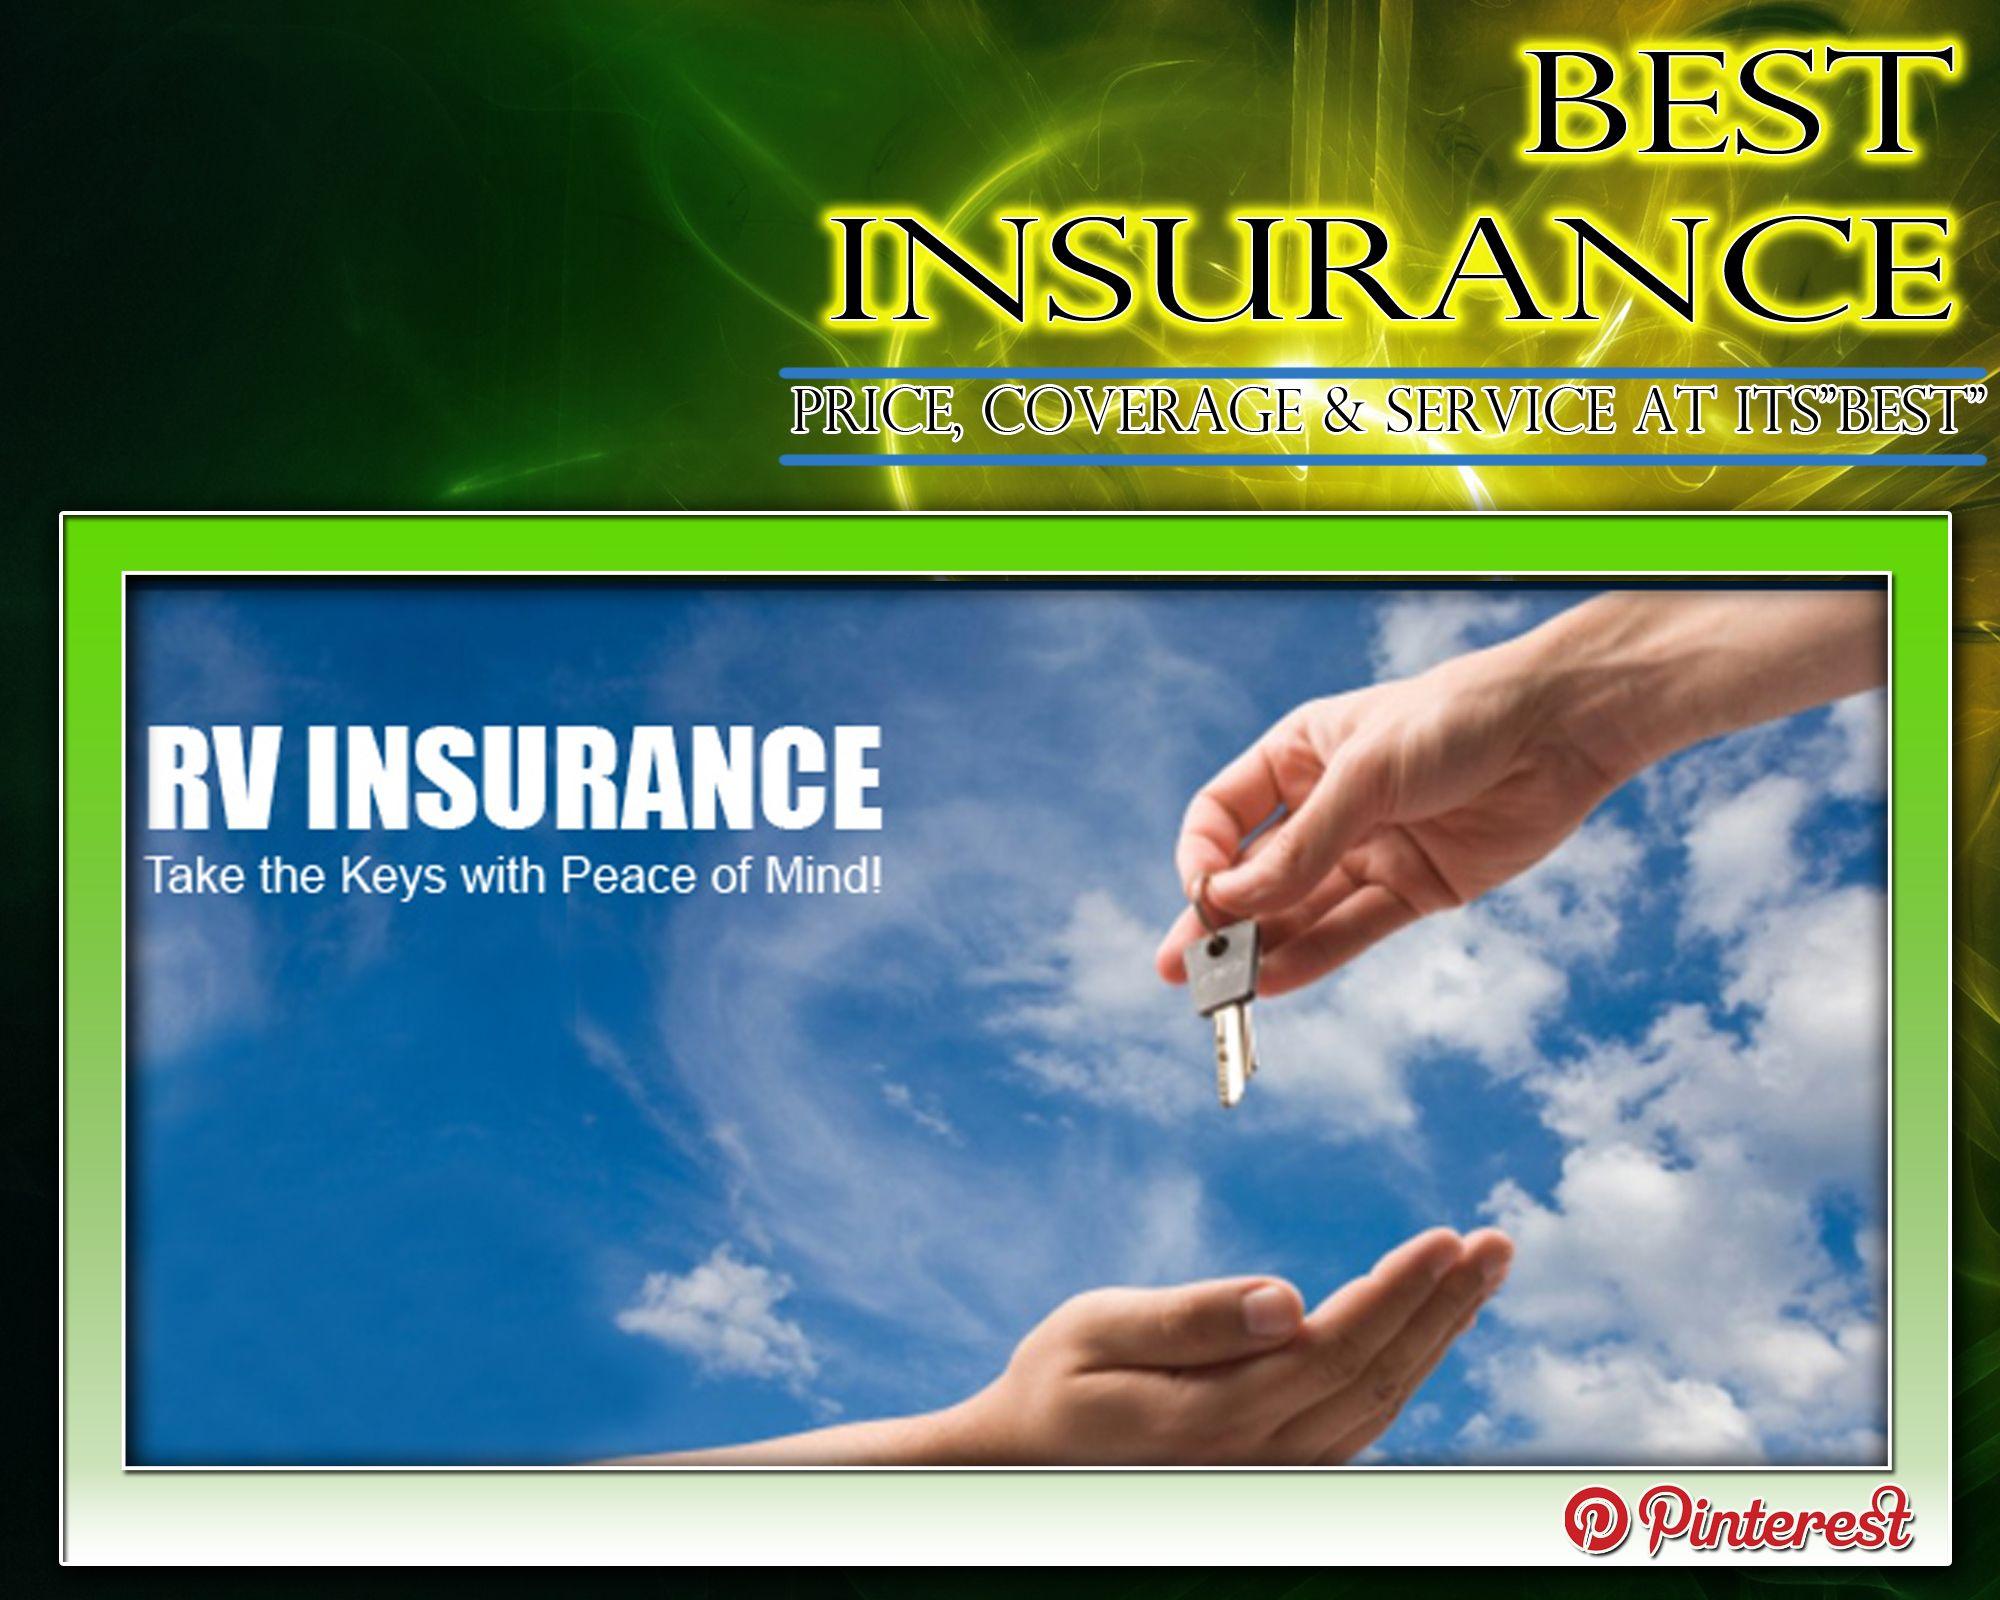 Homeownersinsuranceft Lauderdale Rv Insurance Rv Insurance